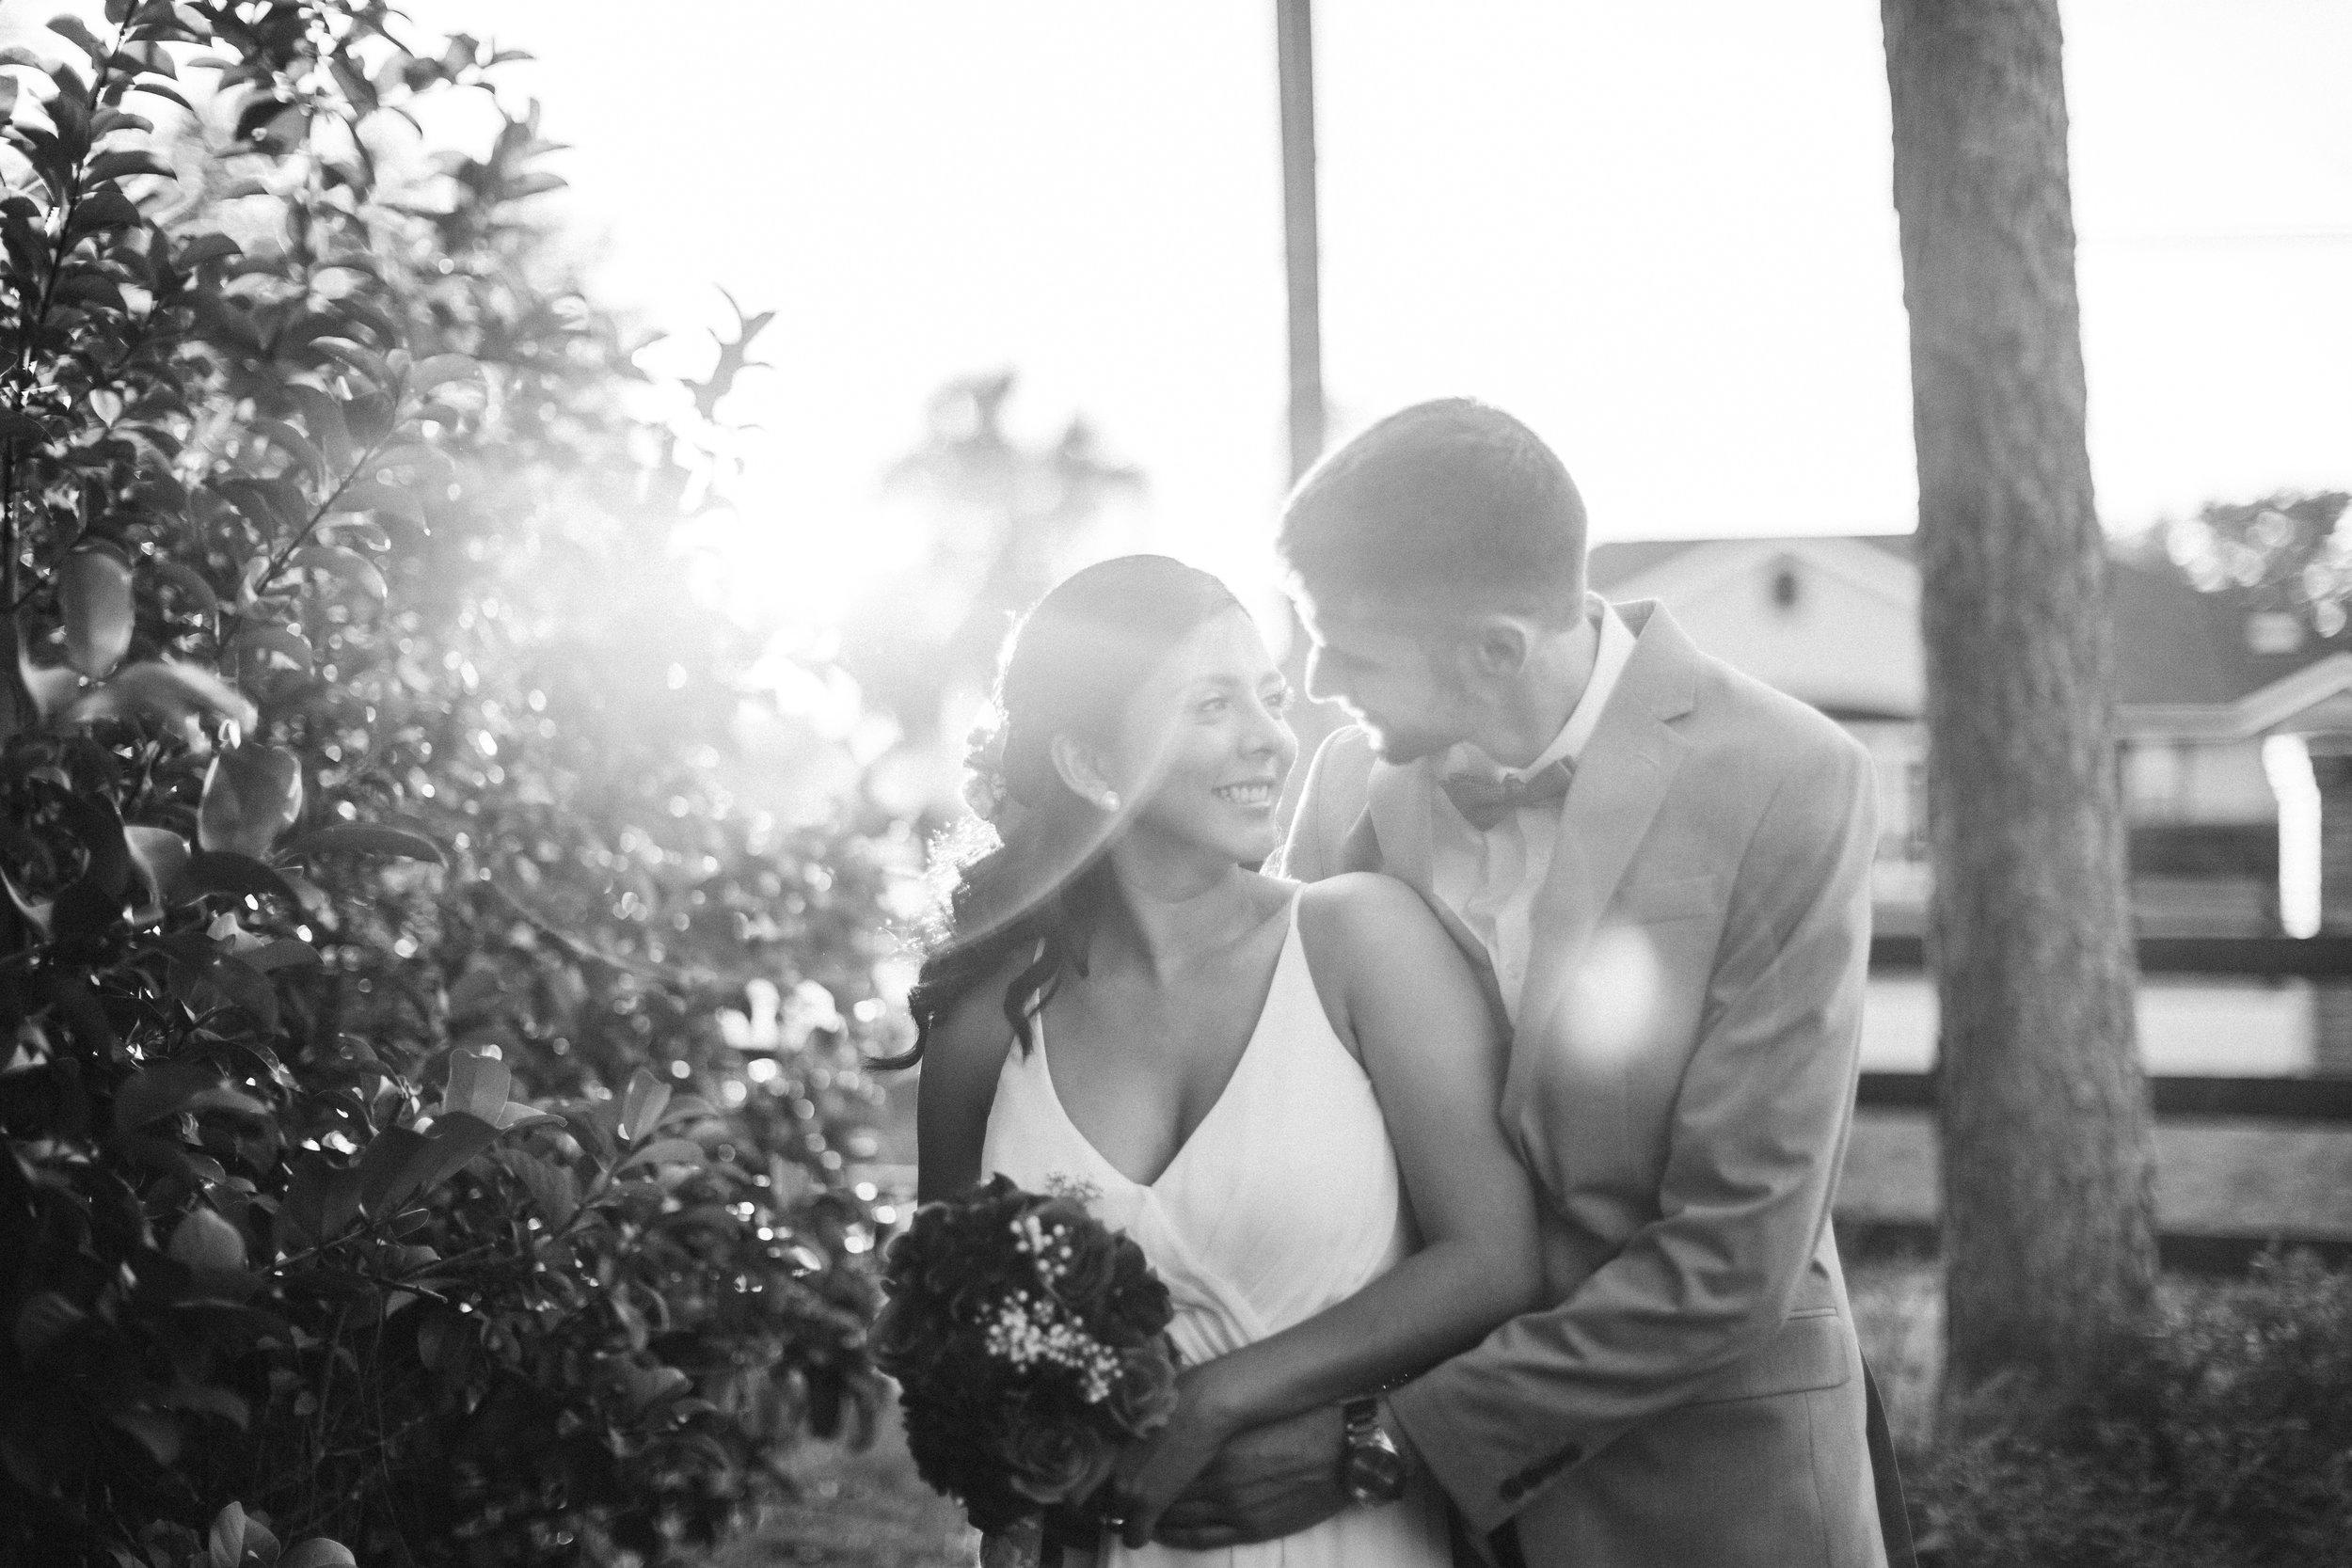 2018.11.03 Jael and Edel Ocala Wedding FINALS (307 of 441).jpg